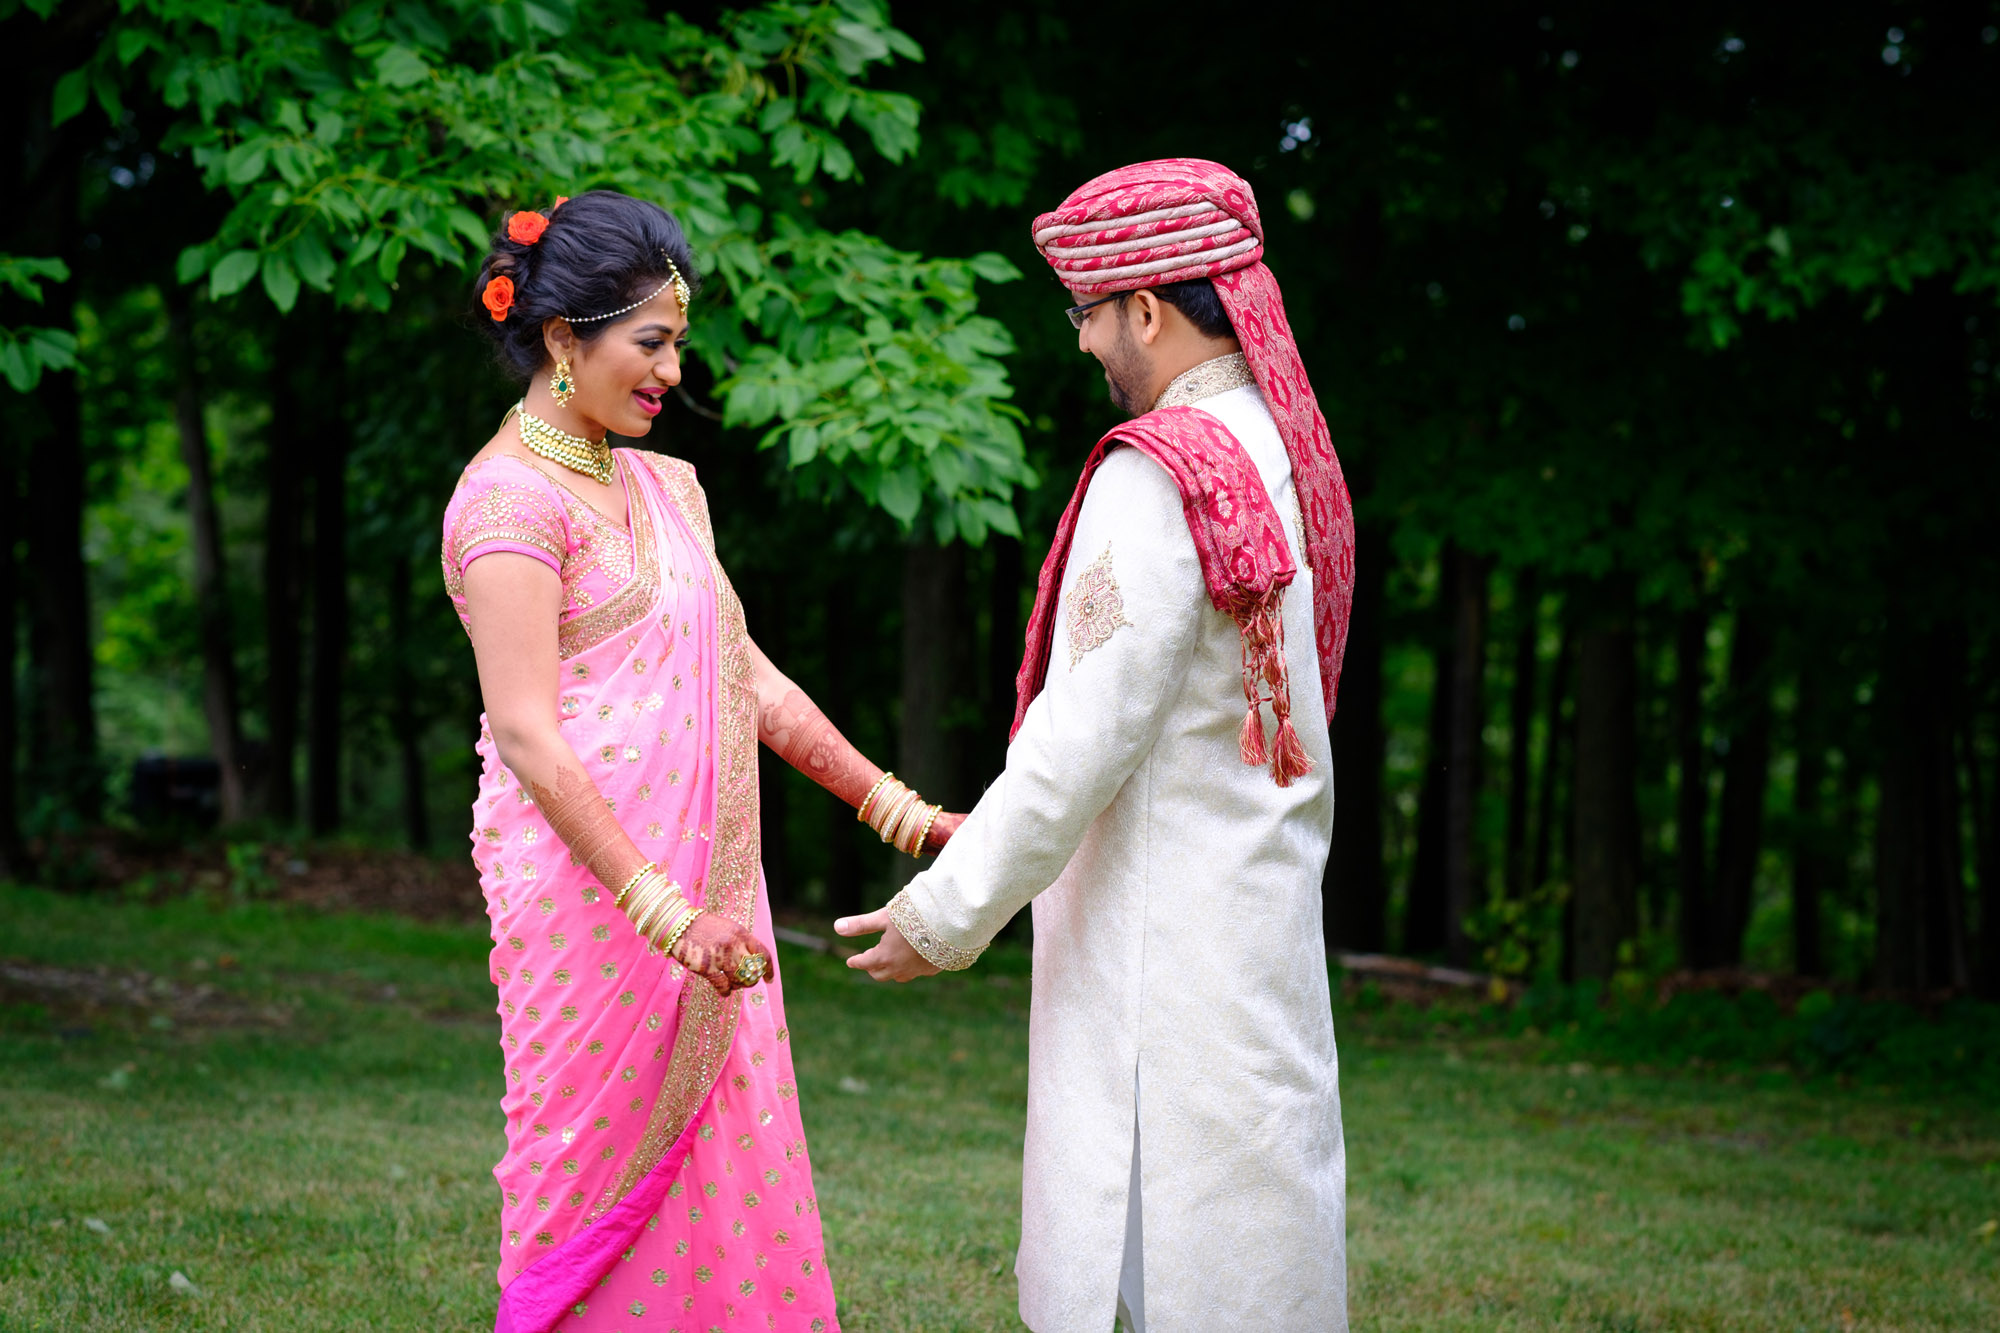 malika & nadir woodsgate stroudsmoor wedding 16